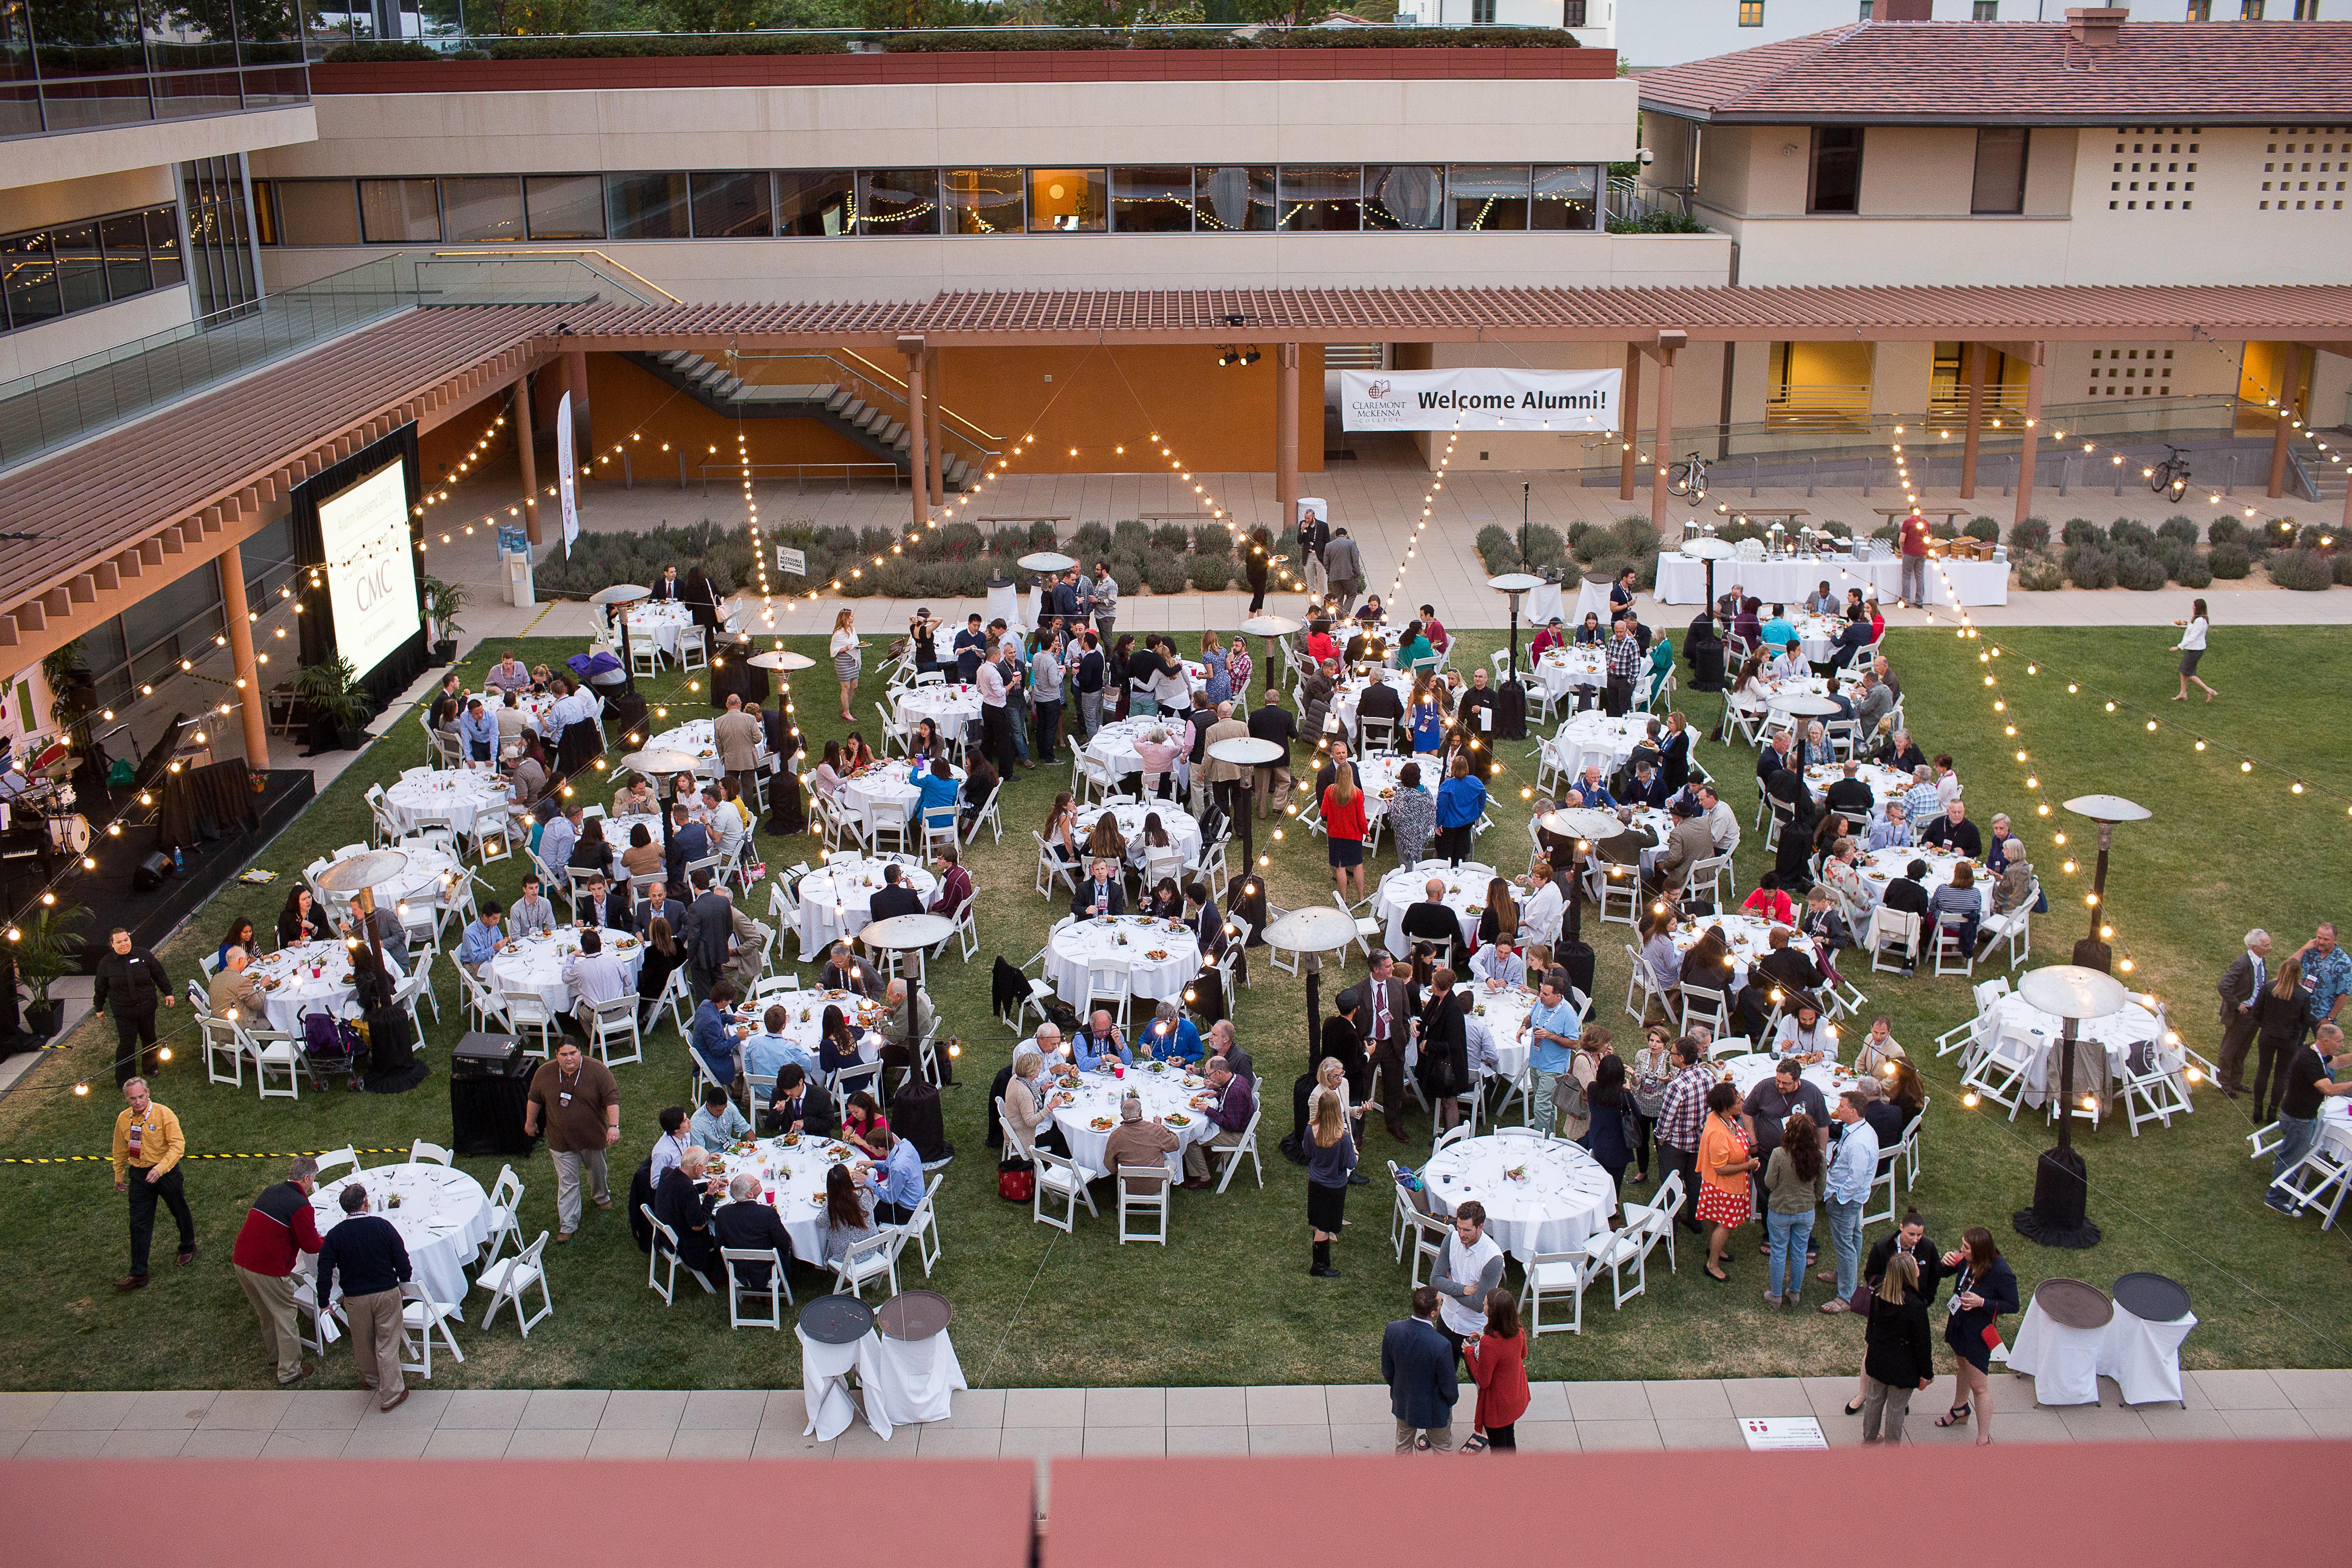 Alumni gather near the Kravis Center for an alumni weekend reception.